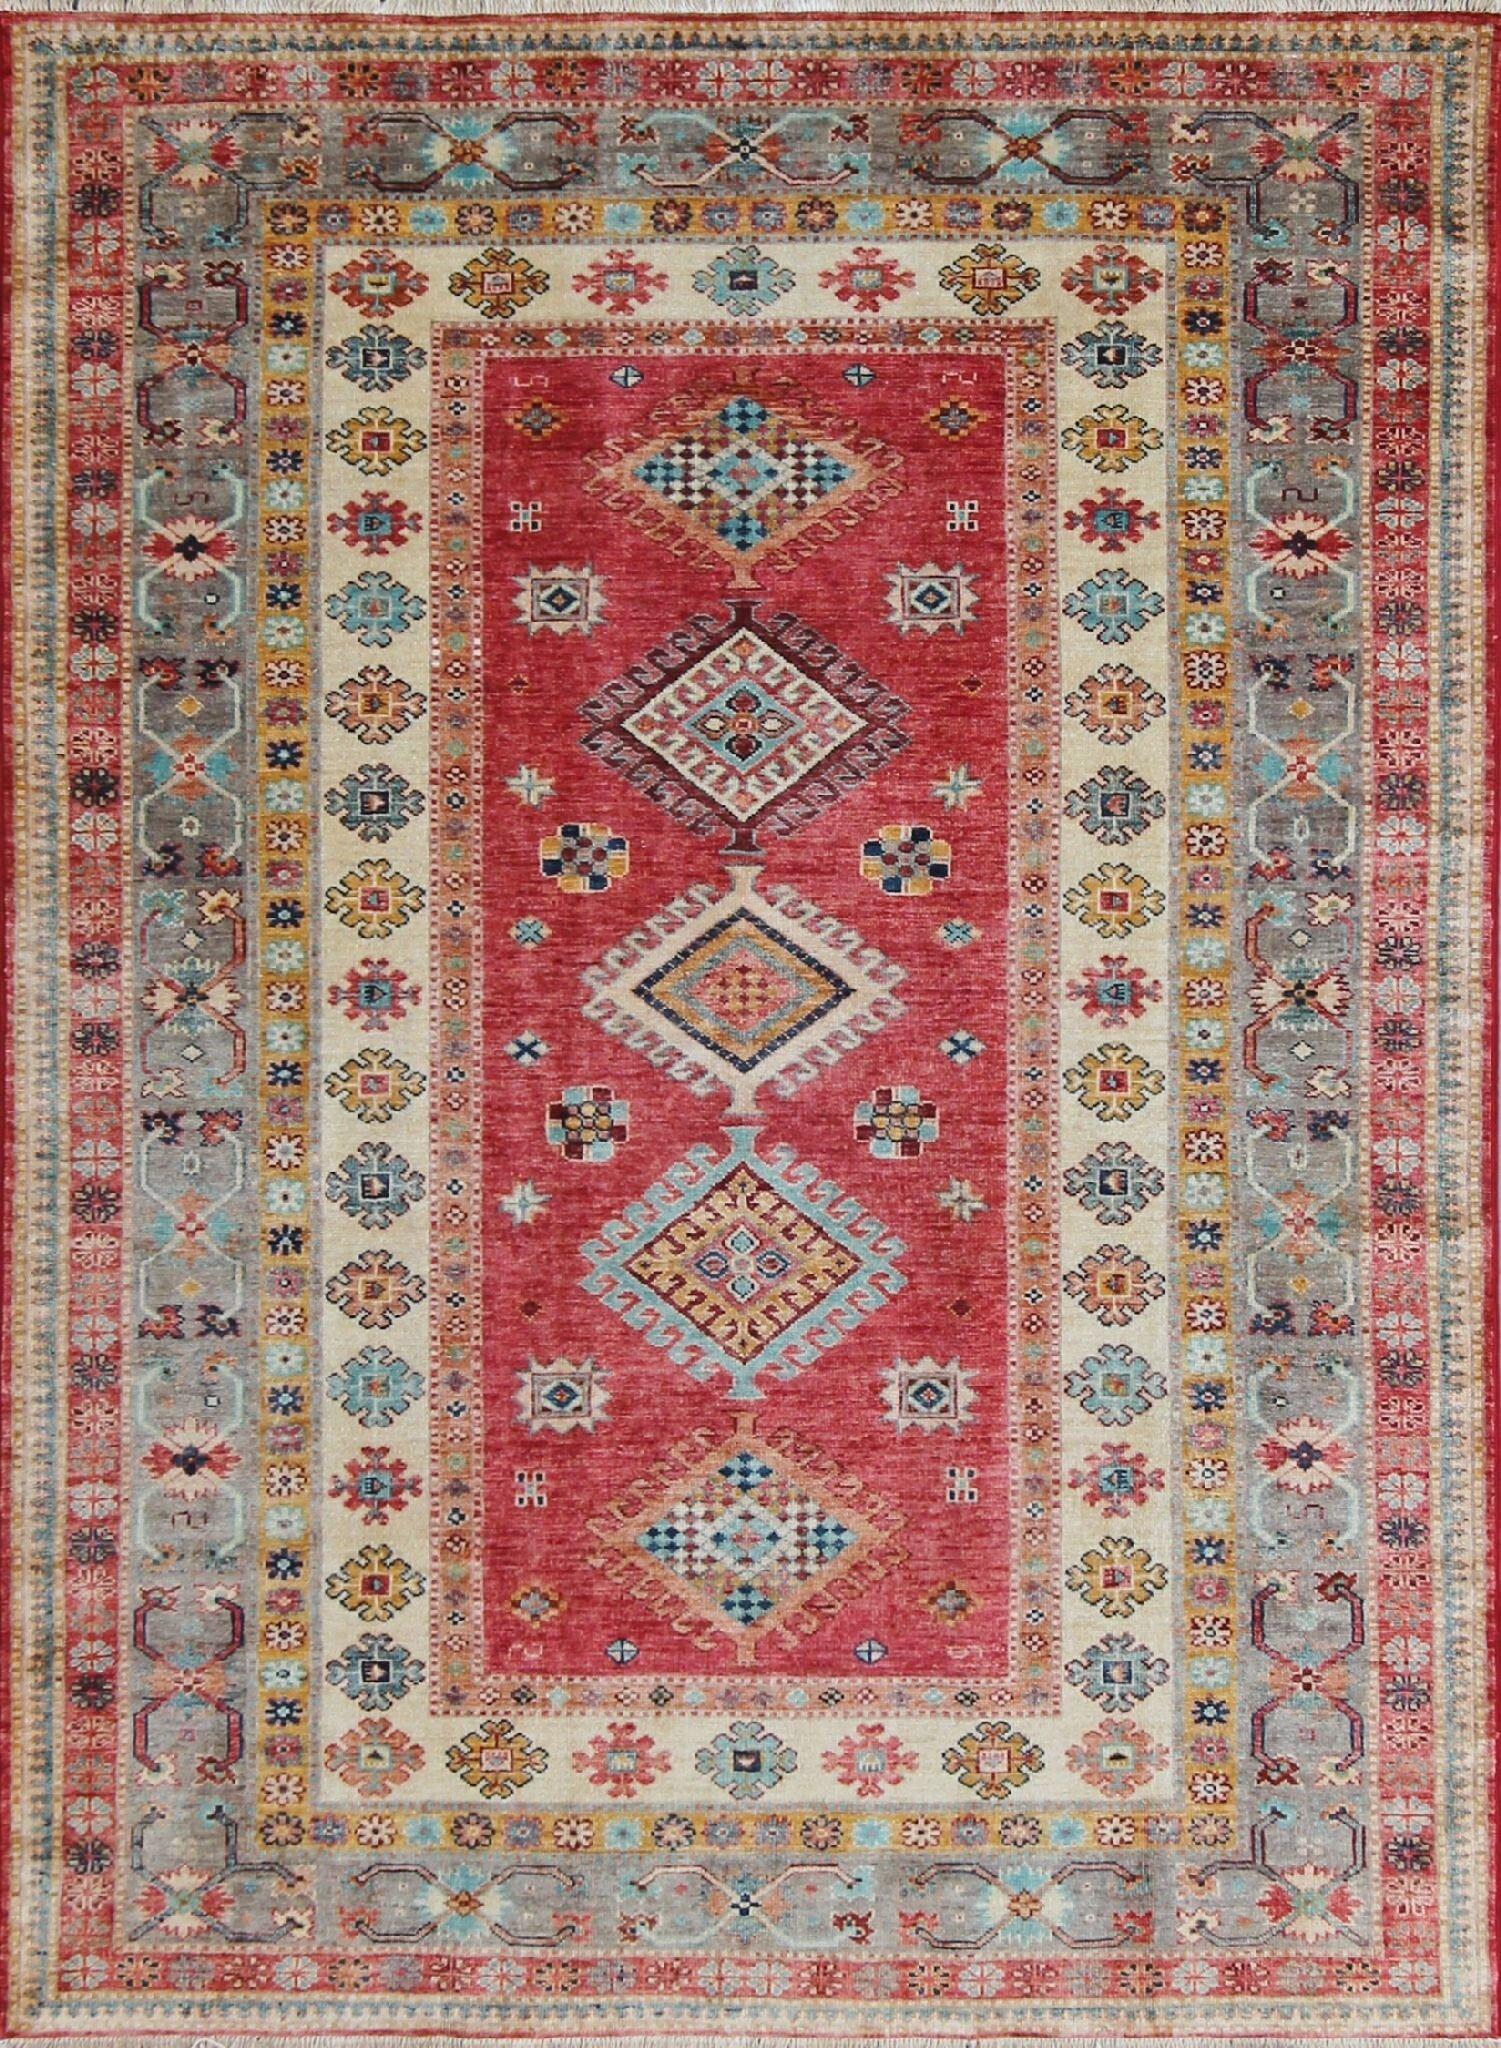 Afghan Kazak Rug 2 05m X 1 50m